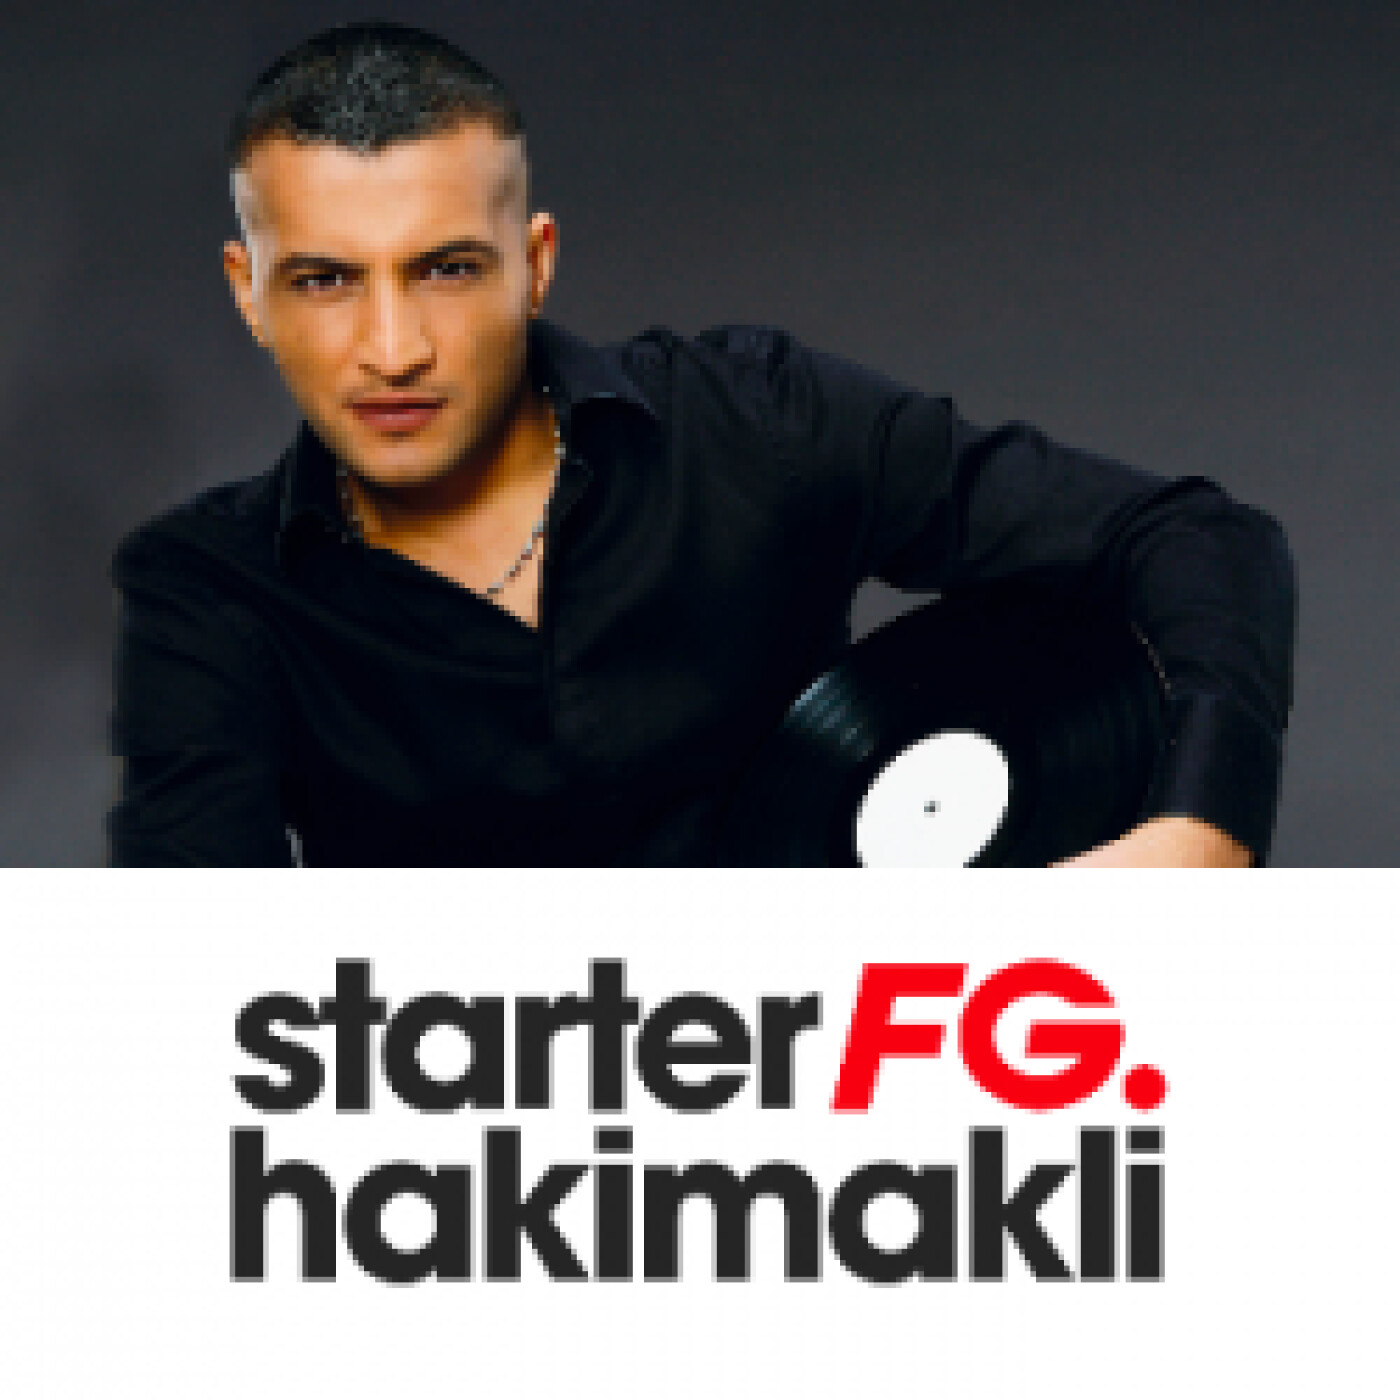 STARTER FG BY HAKIMAKLI JEUDI 25 MARS 2021